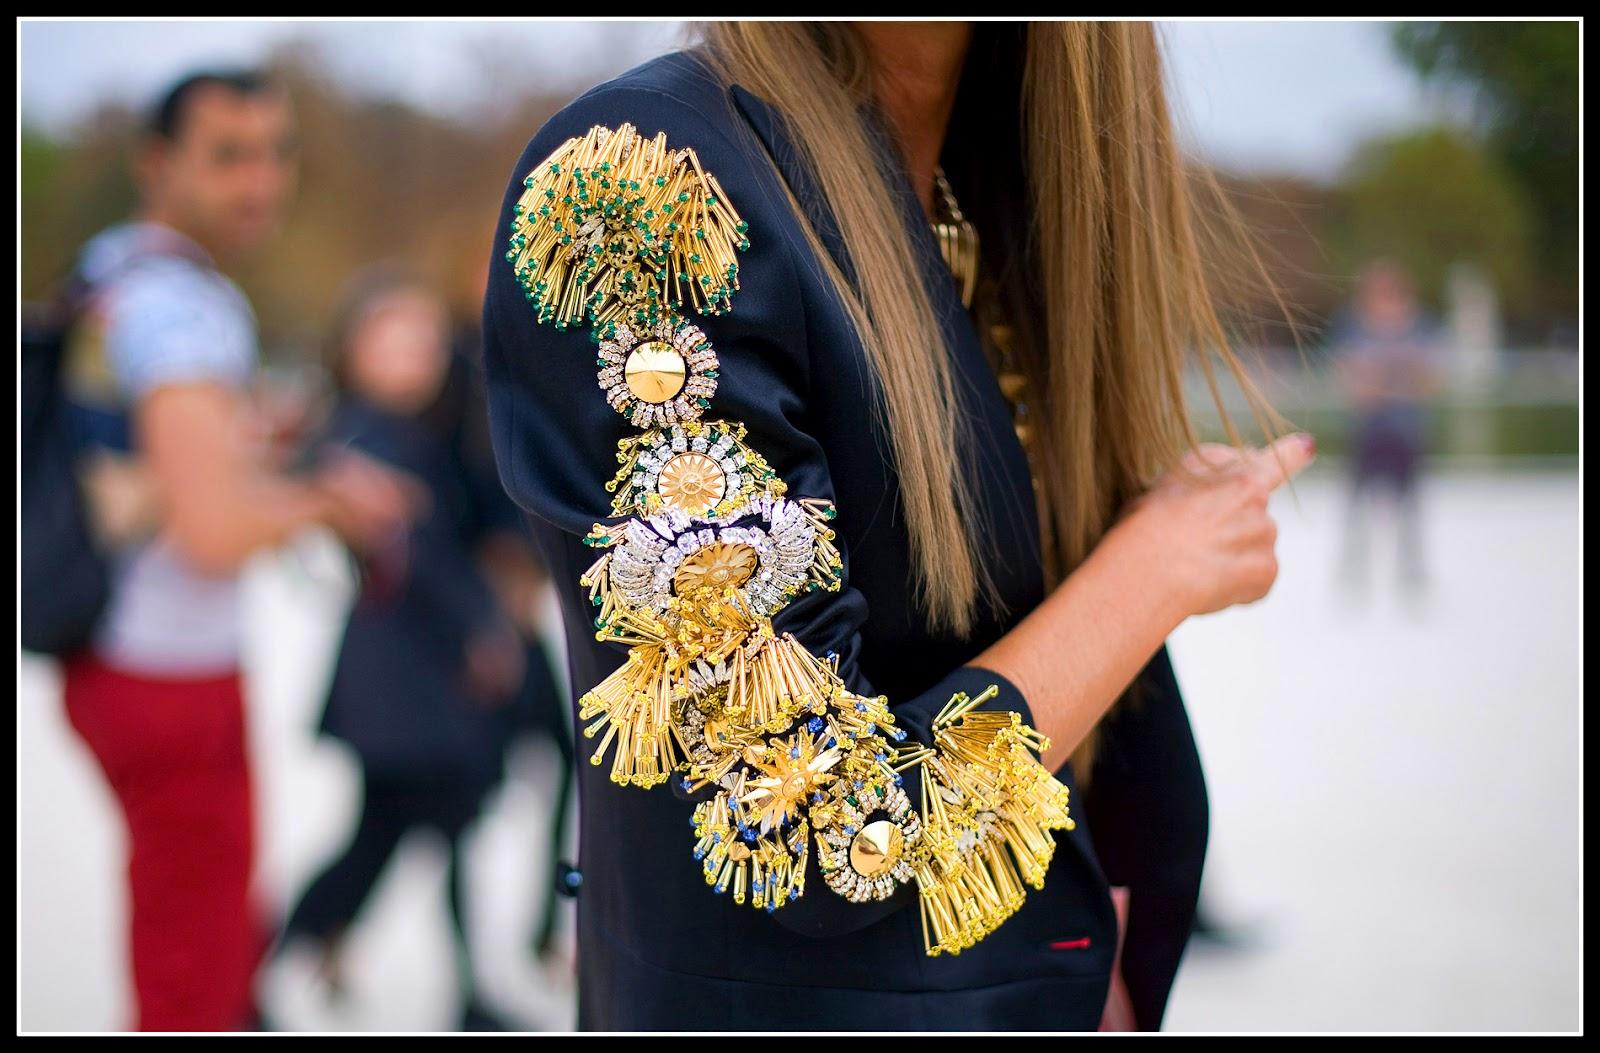 http://4.bp.blogspot.com/-mXNIscXGlSM/T4woSckM89I/AAAAAAAABzo/JevBKCNGYJs/s1600/paris-street-fashion-embellished+blazer.jpg